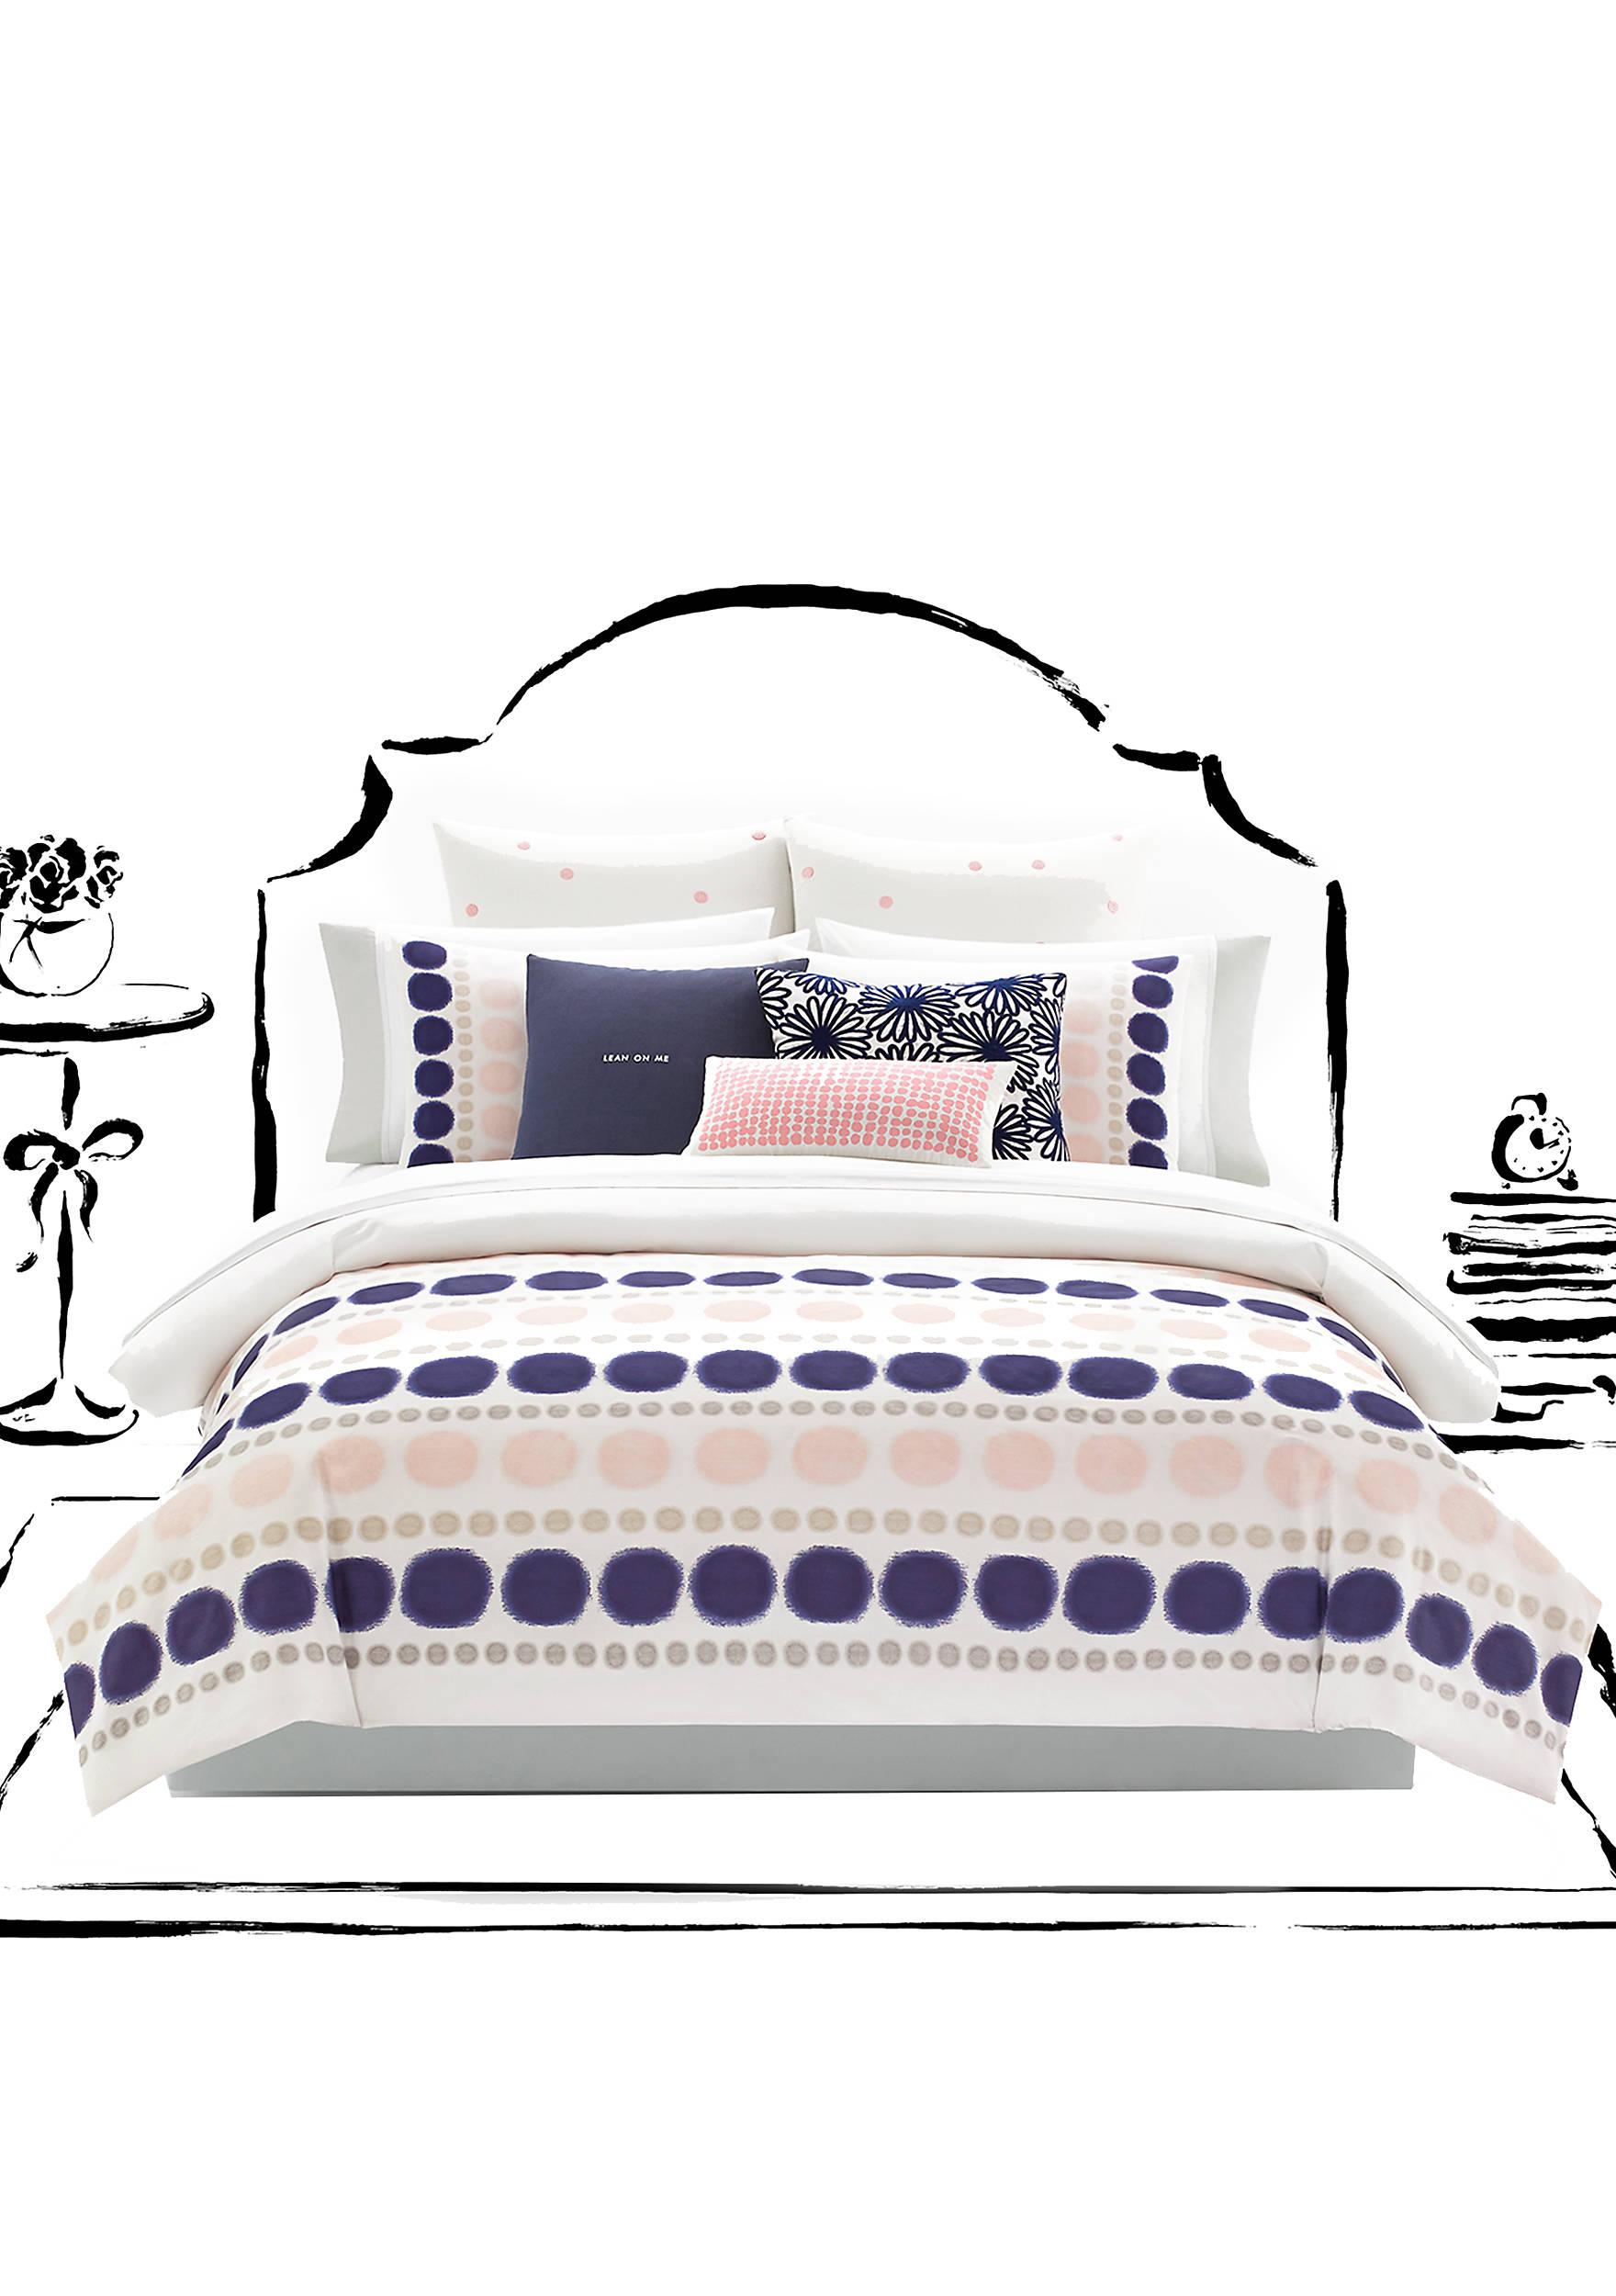 Kate Spade Bedding Kate Spade New Yorkar Ikat Dot Comforter Set Belk